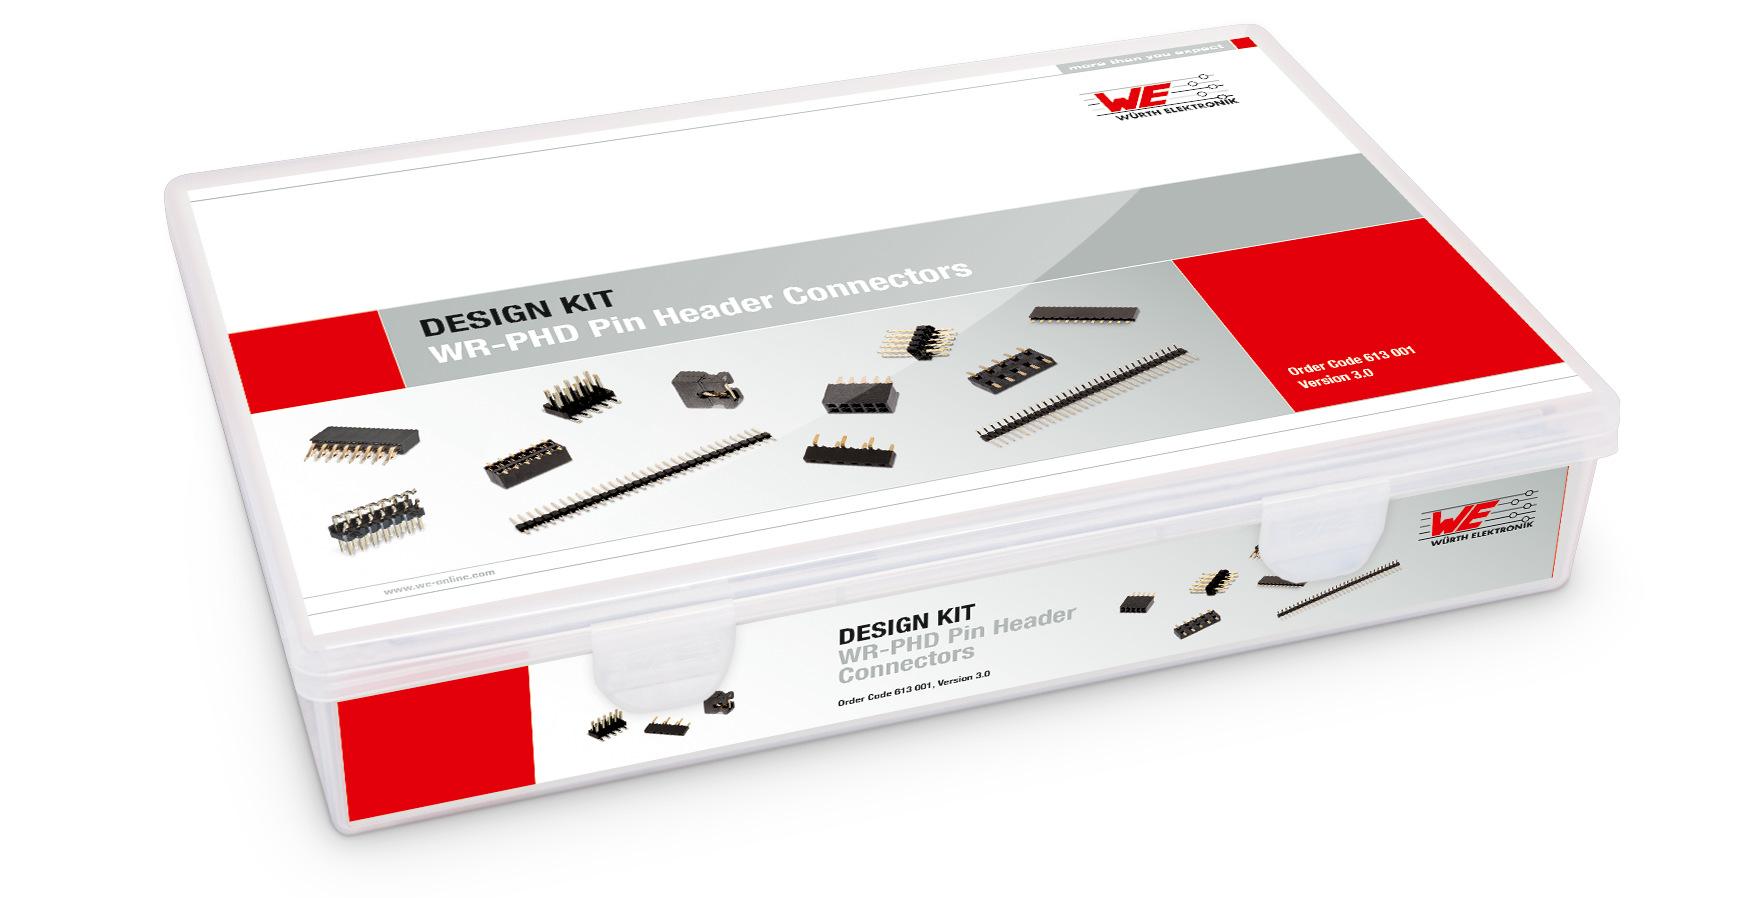 613001 Wurth Elektronik   613001 купить на Symmetron.ru, спецификации, схемы 613001 Wurth Elektronik